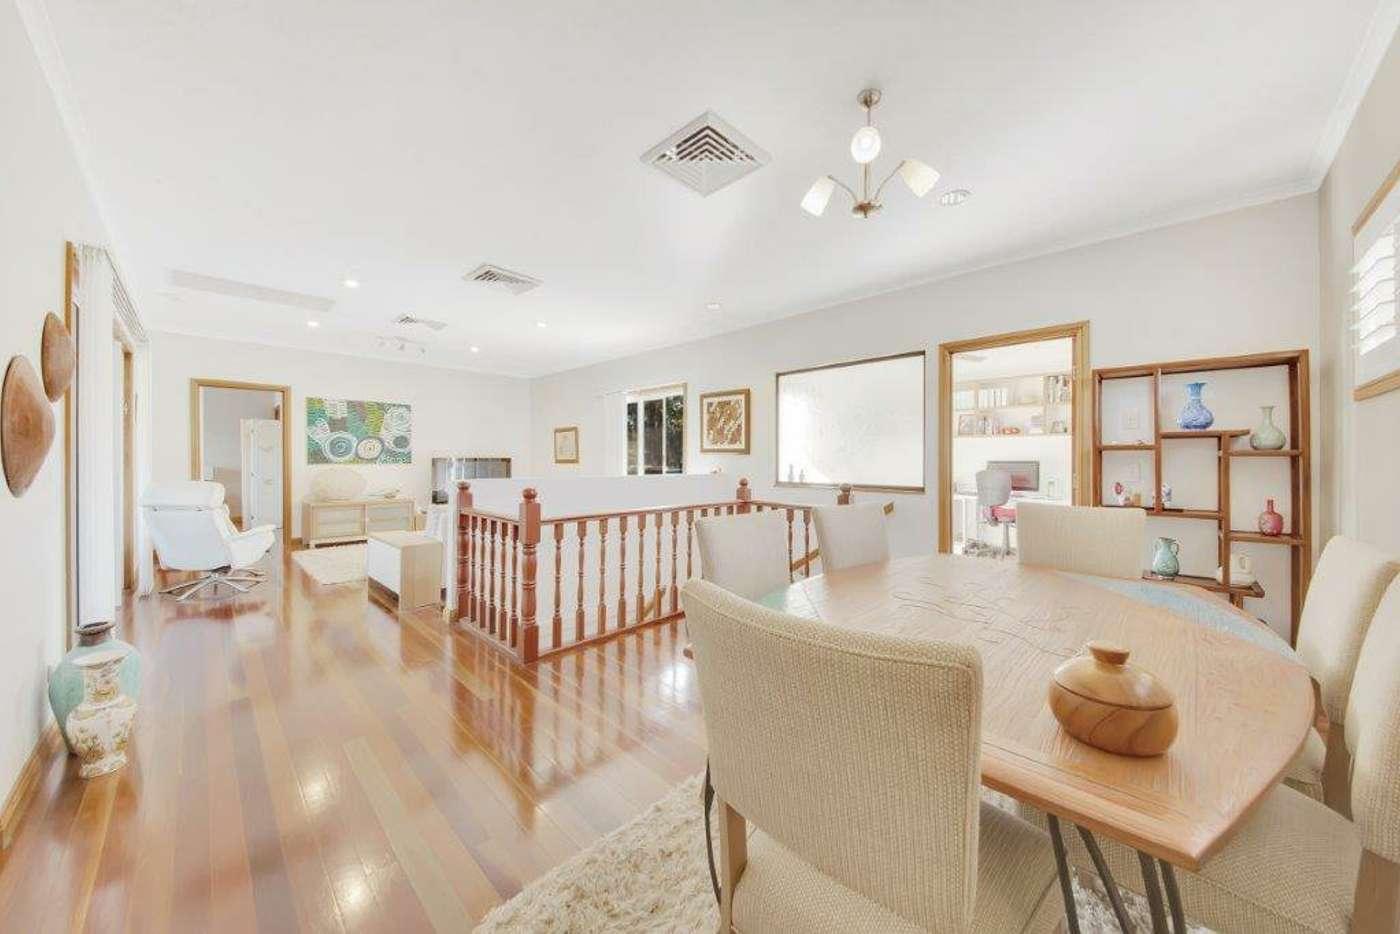 Seventh view of Homely house listing, 55 Tarcoola Drive, Boyne Island QLD 4680